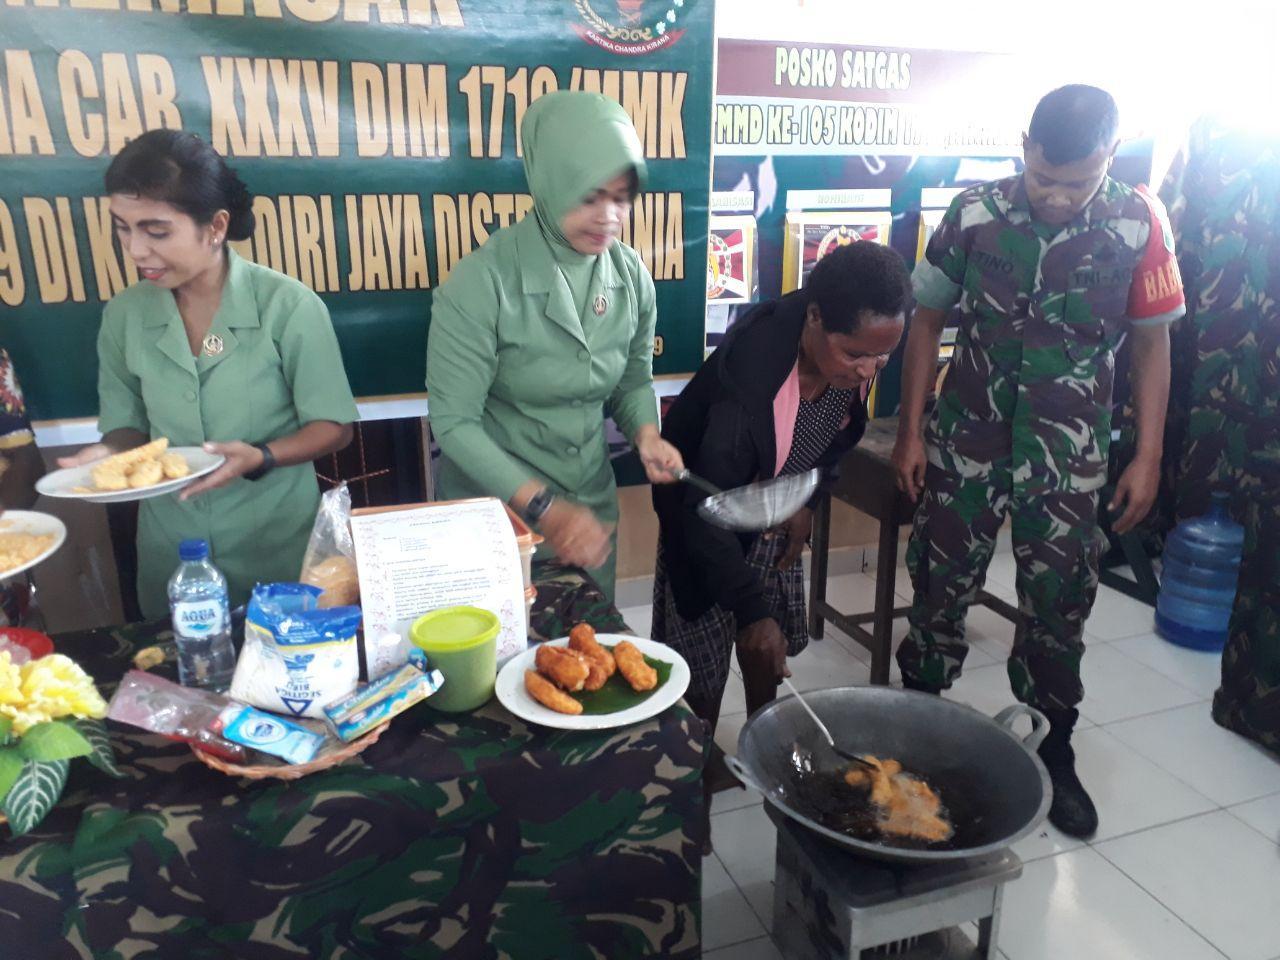 Persit KCK Cabang XXXV DIM 1710/Mimika Latih Memasak Mama-Mama Kampung Mandiri Jaya